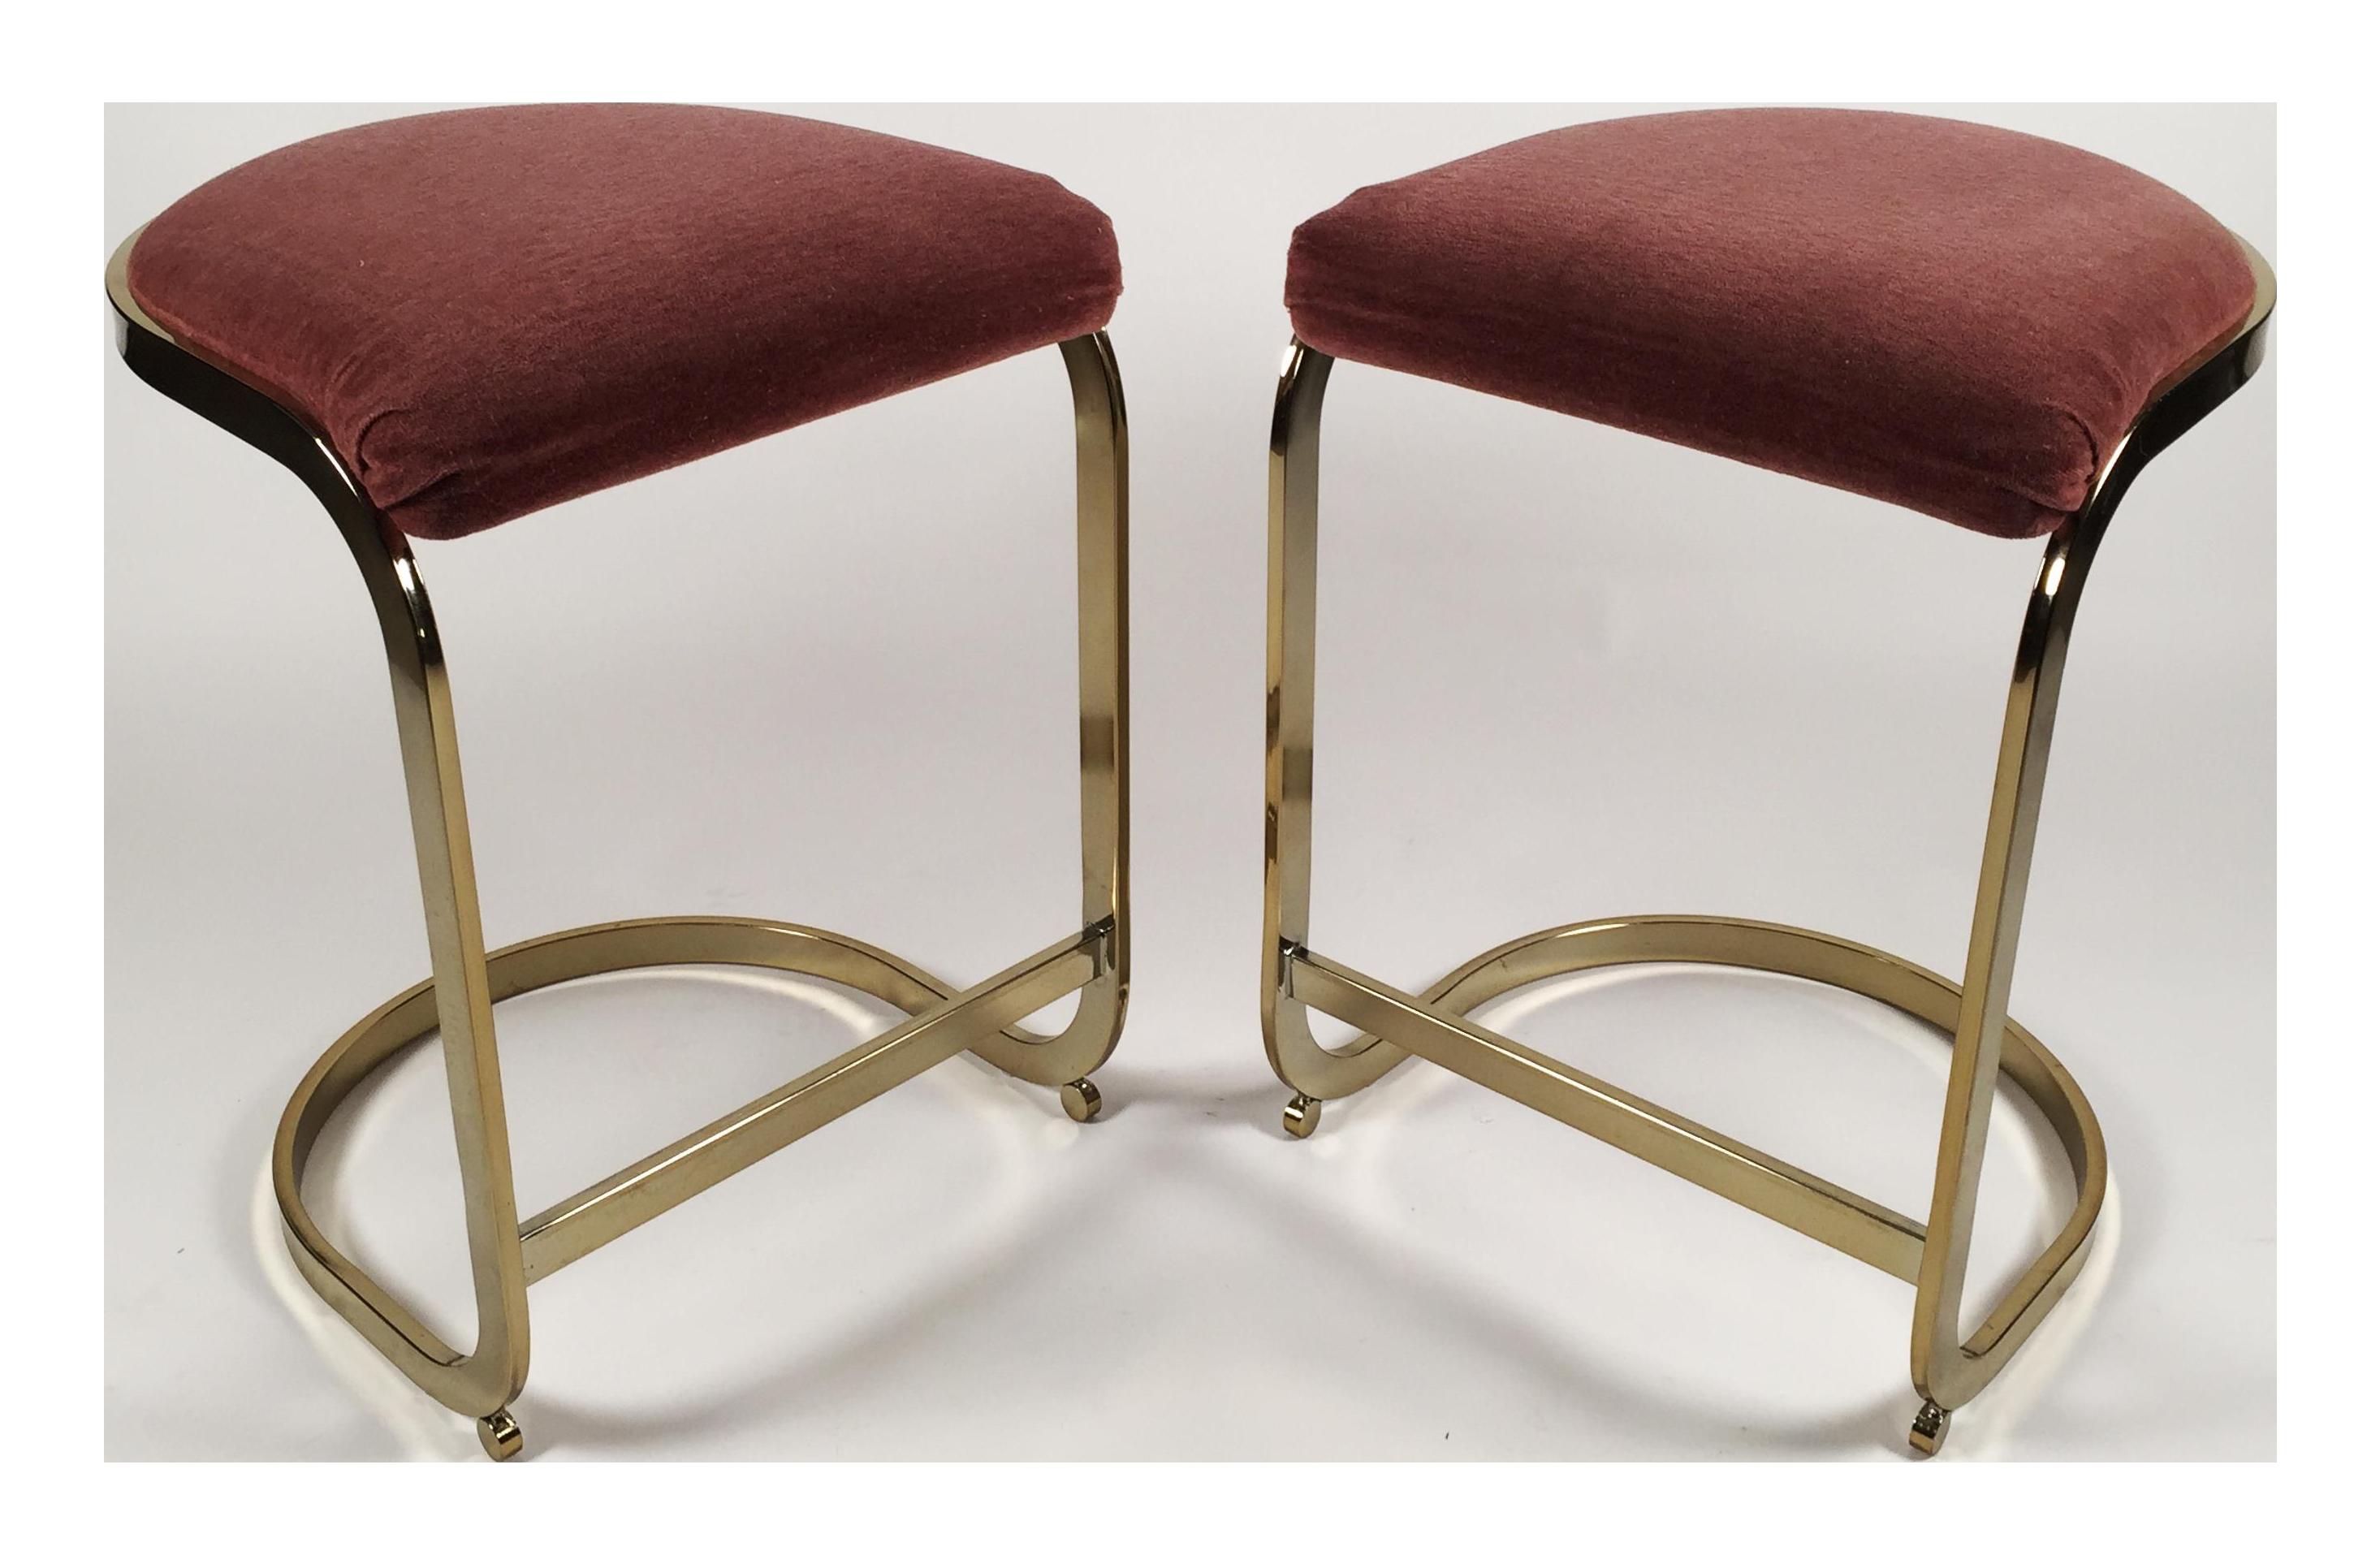 Milo Baughman Style Cantilever Bar Stools A Pair Chairish